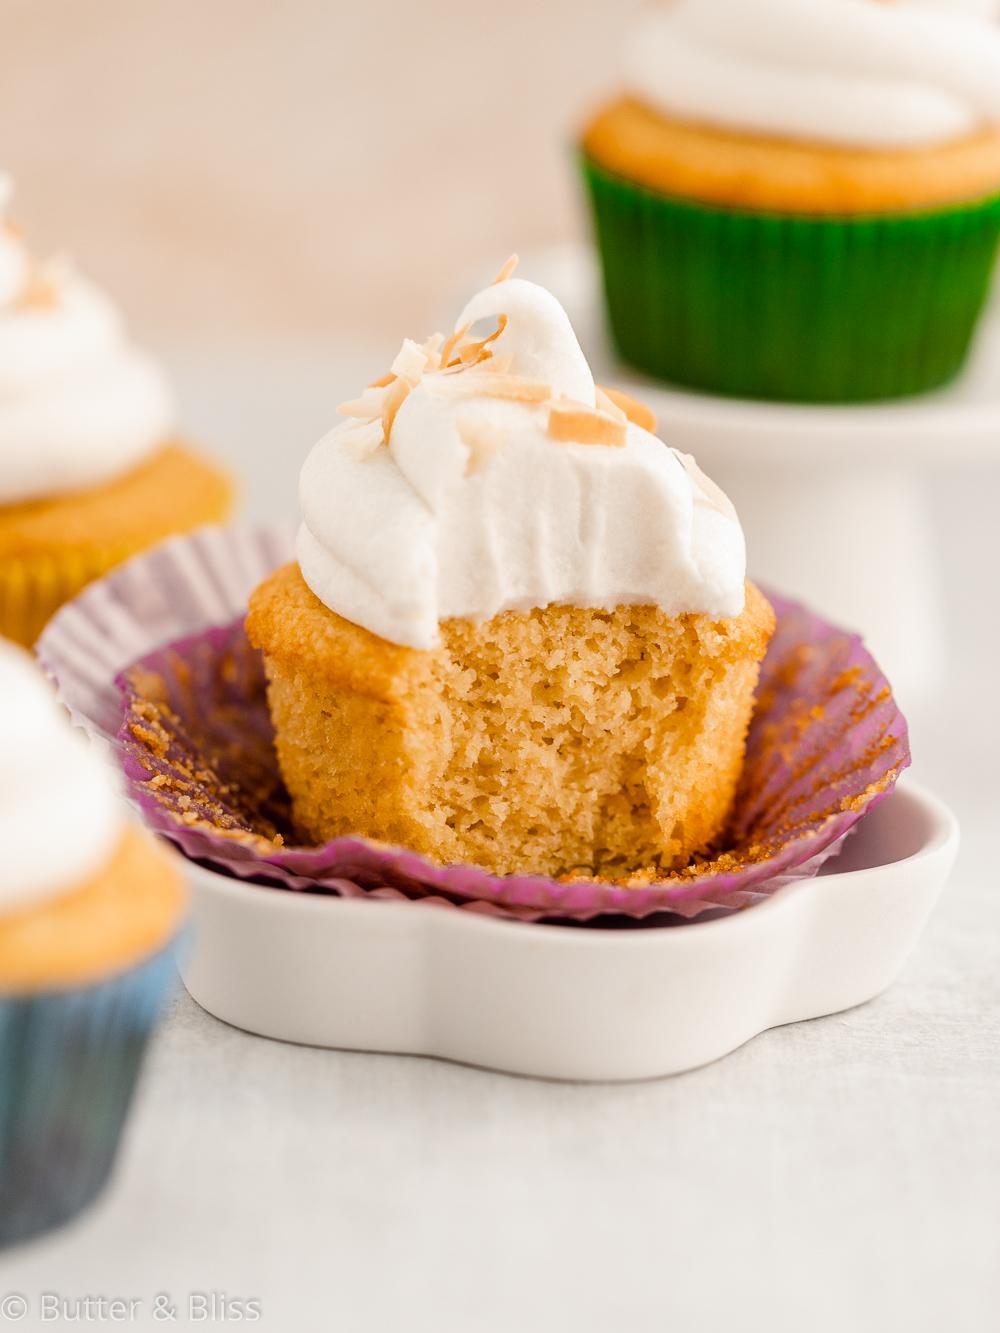 Vanilla cupcake on a small plate